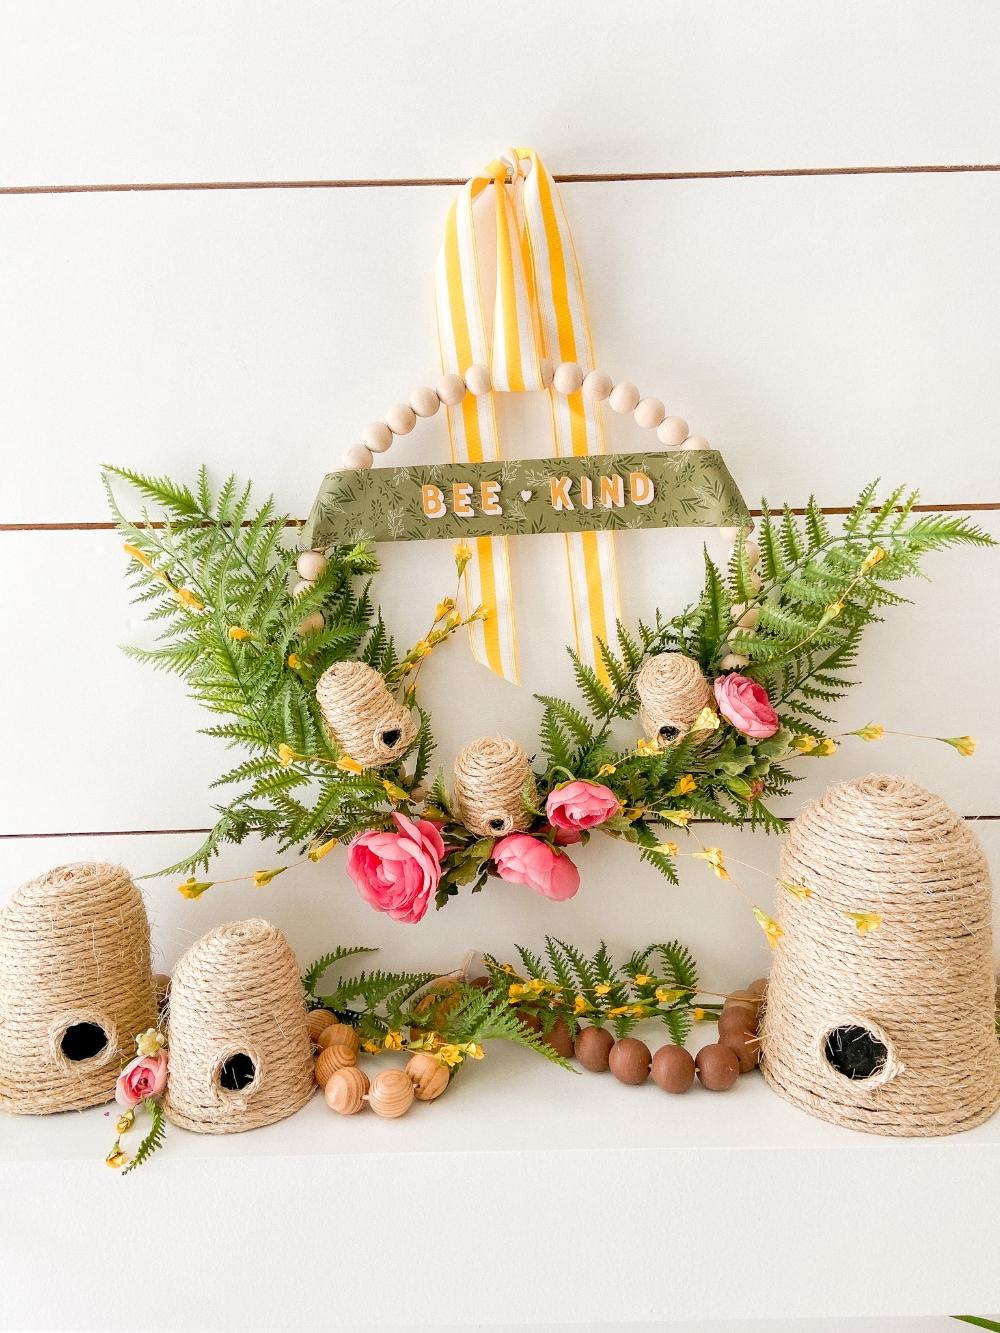 Bee Kind Summer Beaded Beehive Wreath. Celebrate summer by creating a beehive wreath with mini skeps and a Bee Kind Banner!